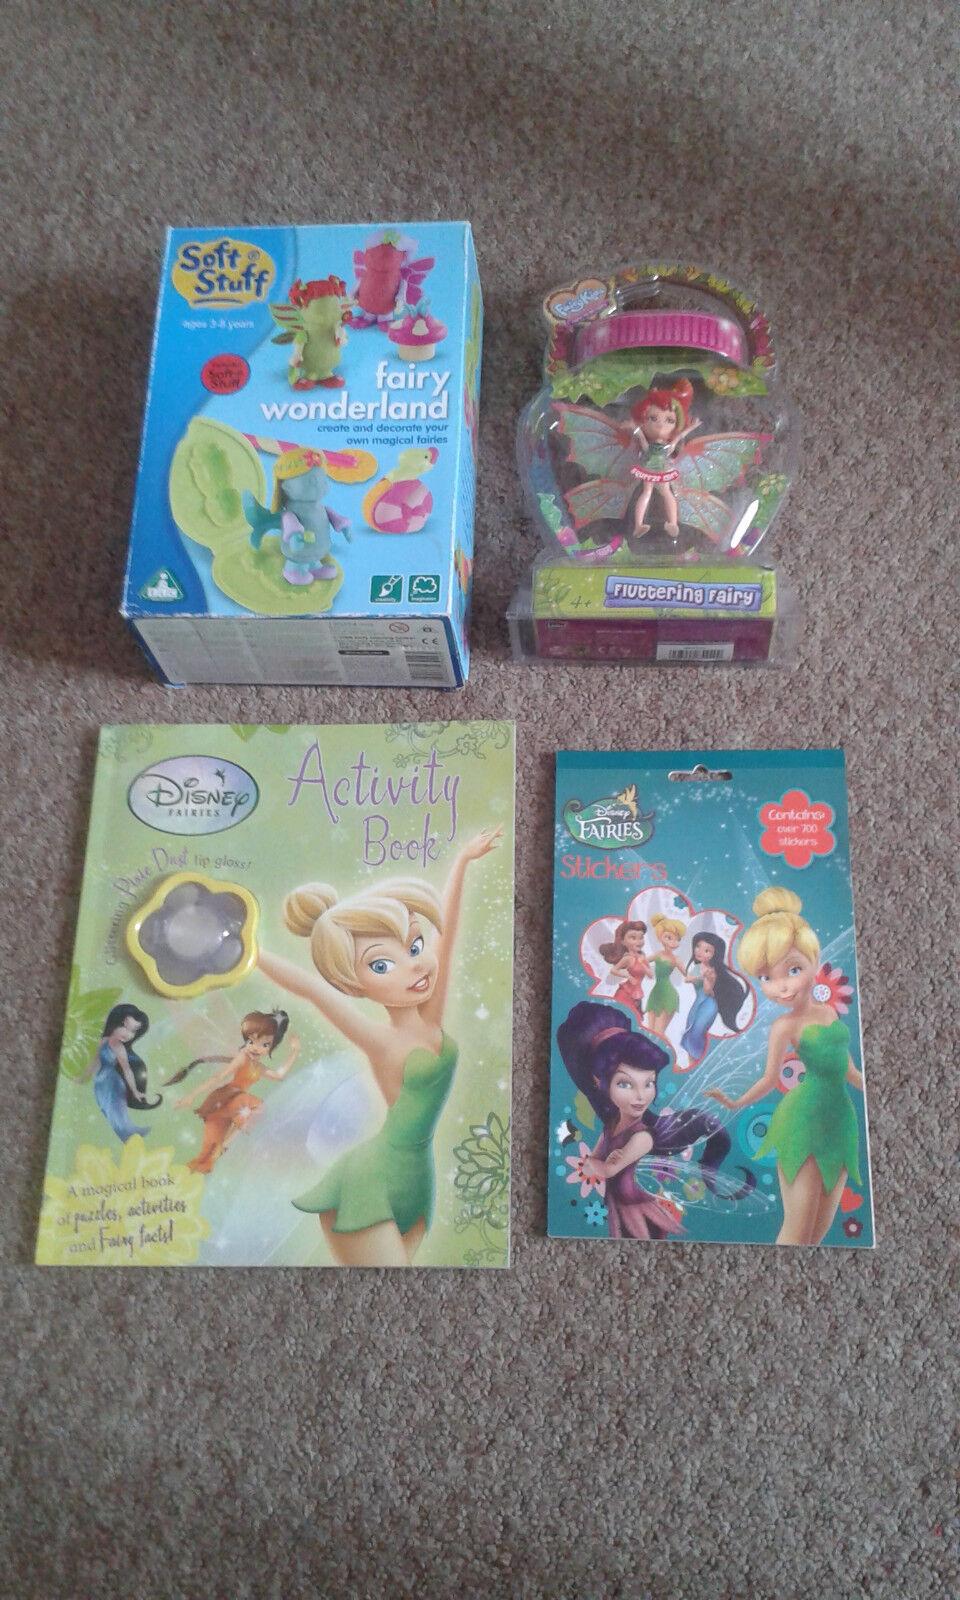 Girls Toy Soft Stuff Playdoh Fluttering Fairy Wonderland Tinkerbell ELC BUNDLE